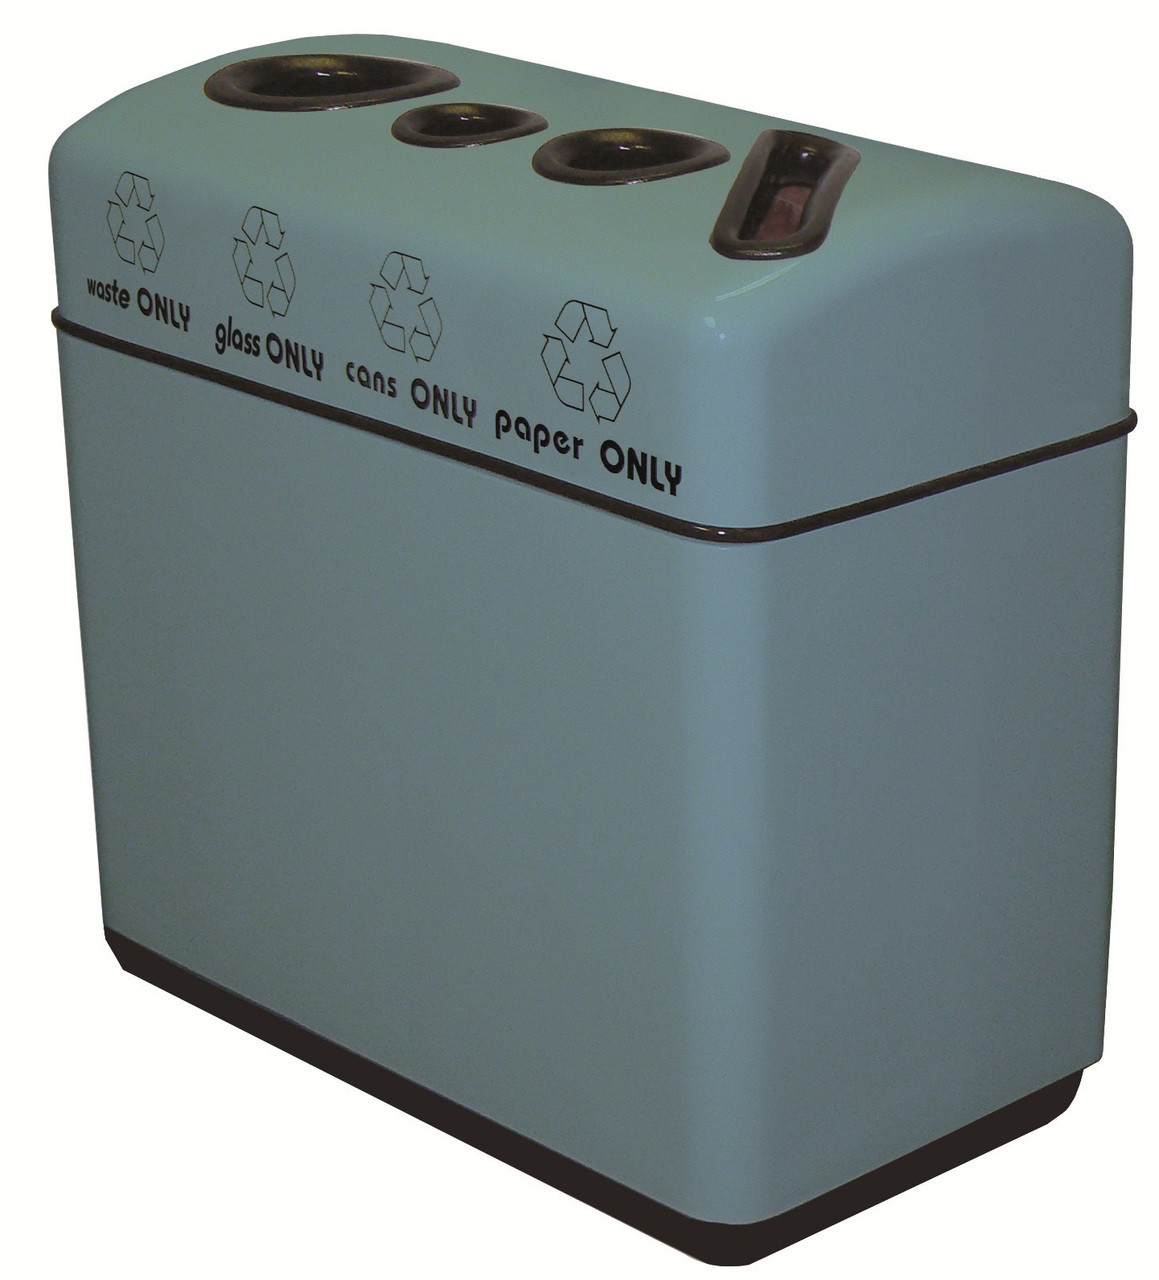 44 Gallon Fiberglass 4 Opening Recyce Bin with Plastic Liner 11RR-481631 (35 Colors)